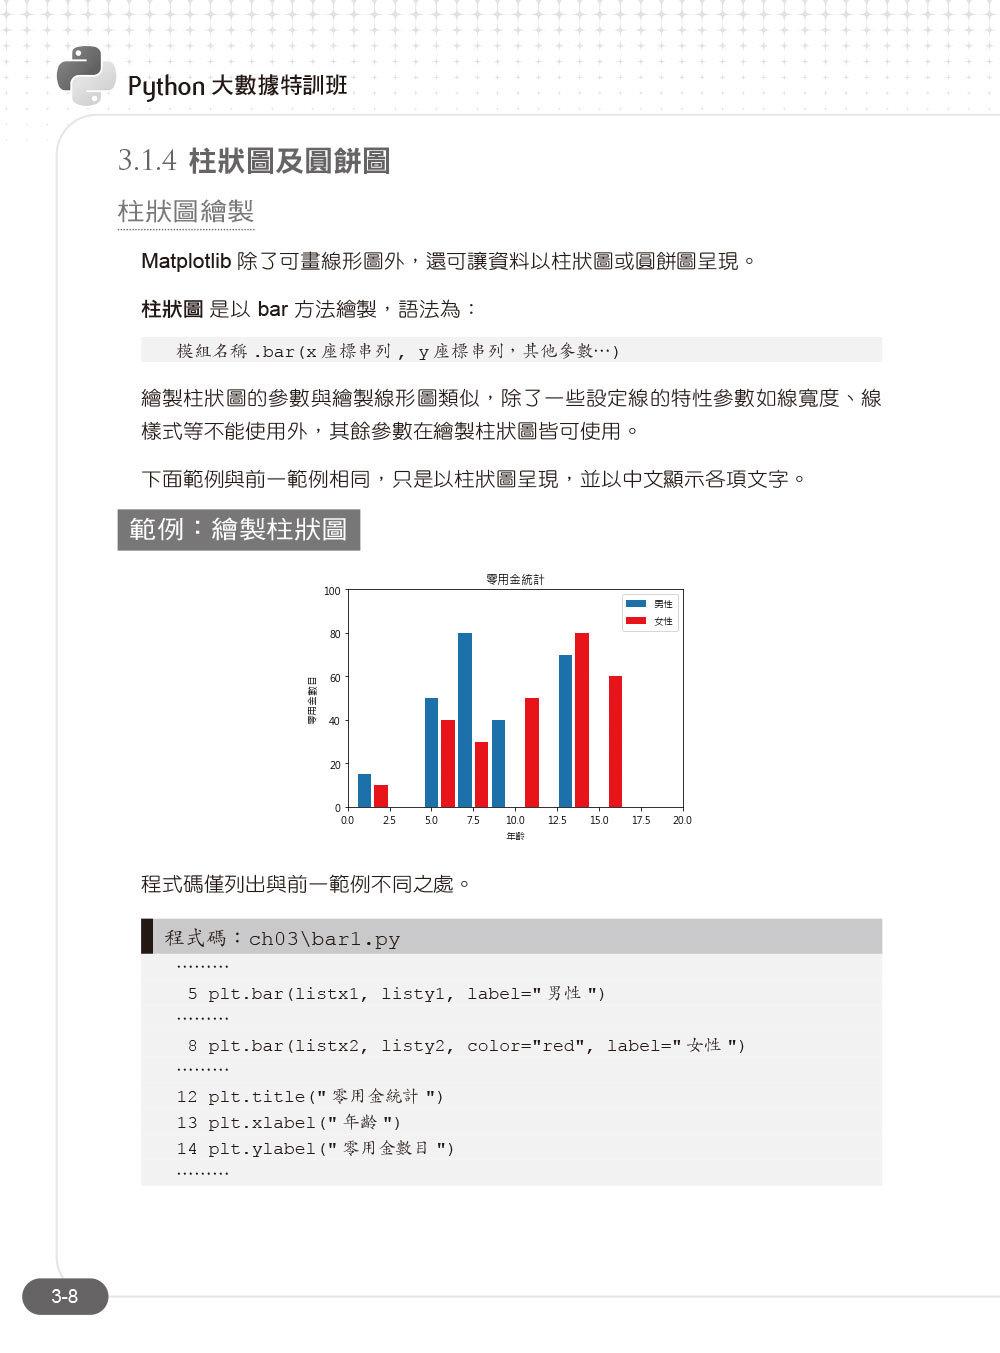 Python 大數據特訓班:資料自動化收集、整理、分析、儲存與應用實戰 (附近300分鐘影音教學/範例程式)-preview-5